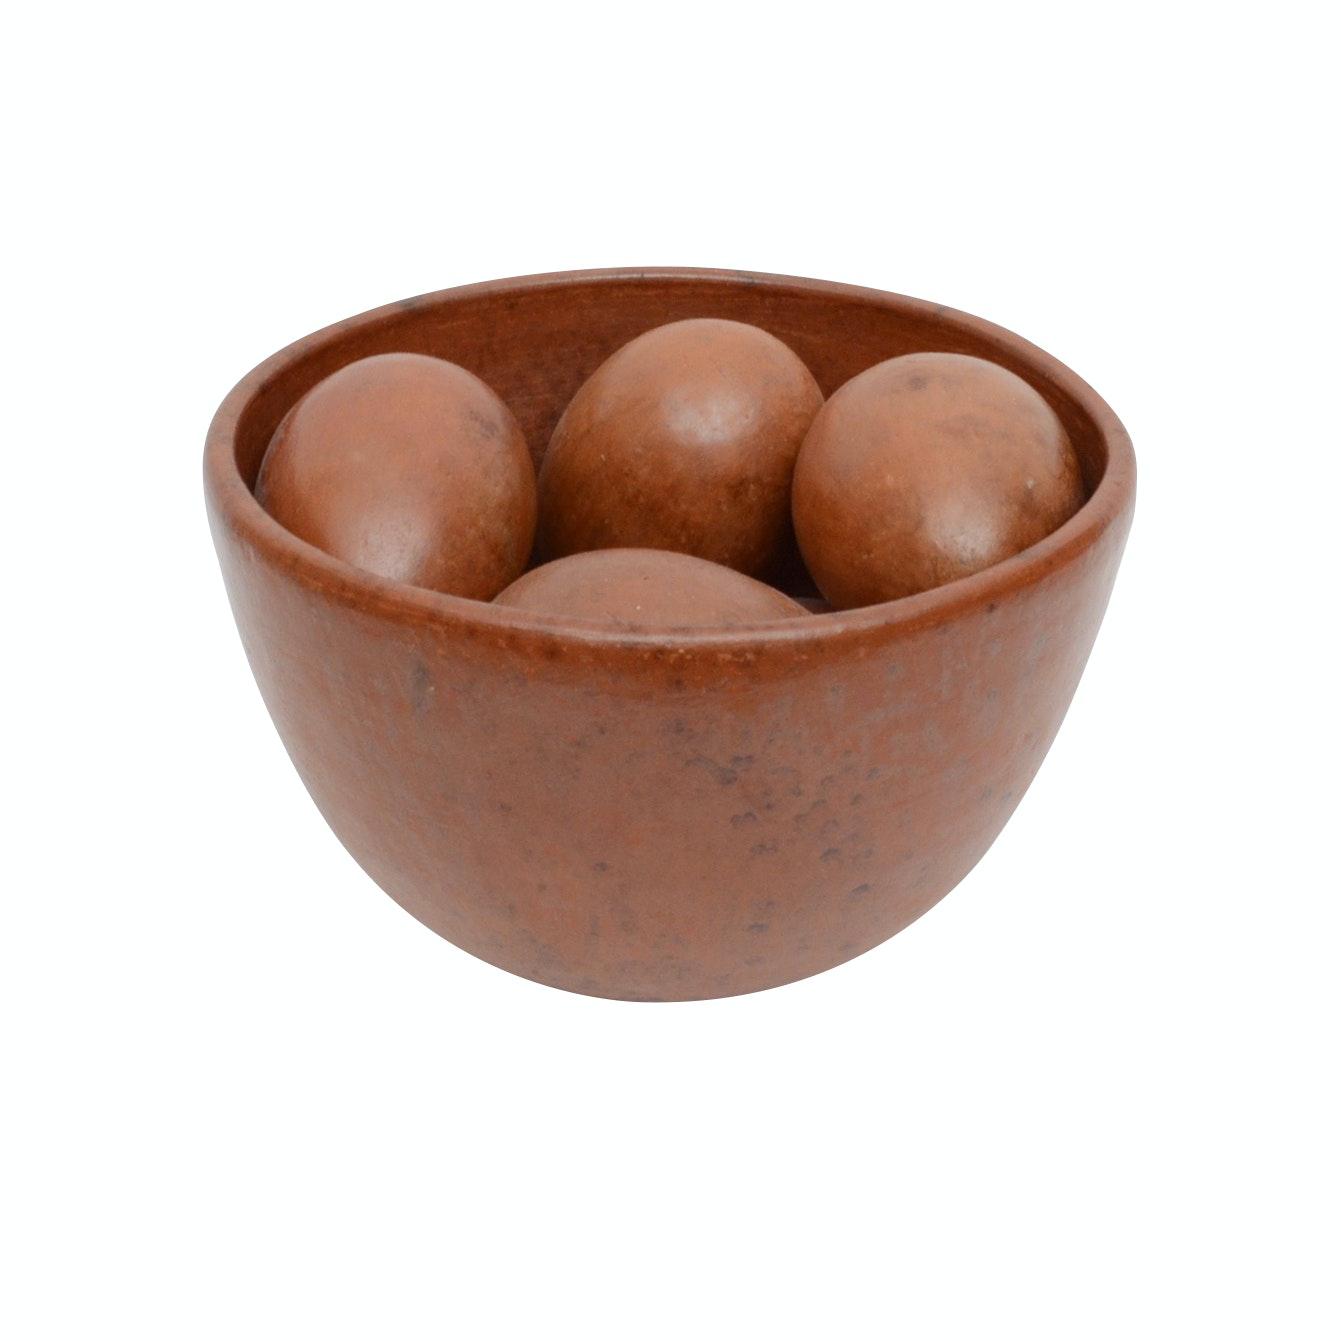 Arhaus Furniture Decorative Bowl with Eggs